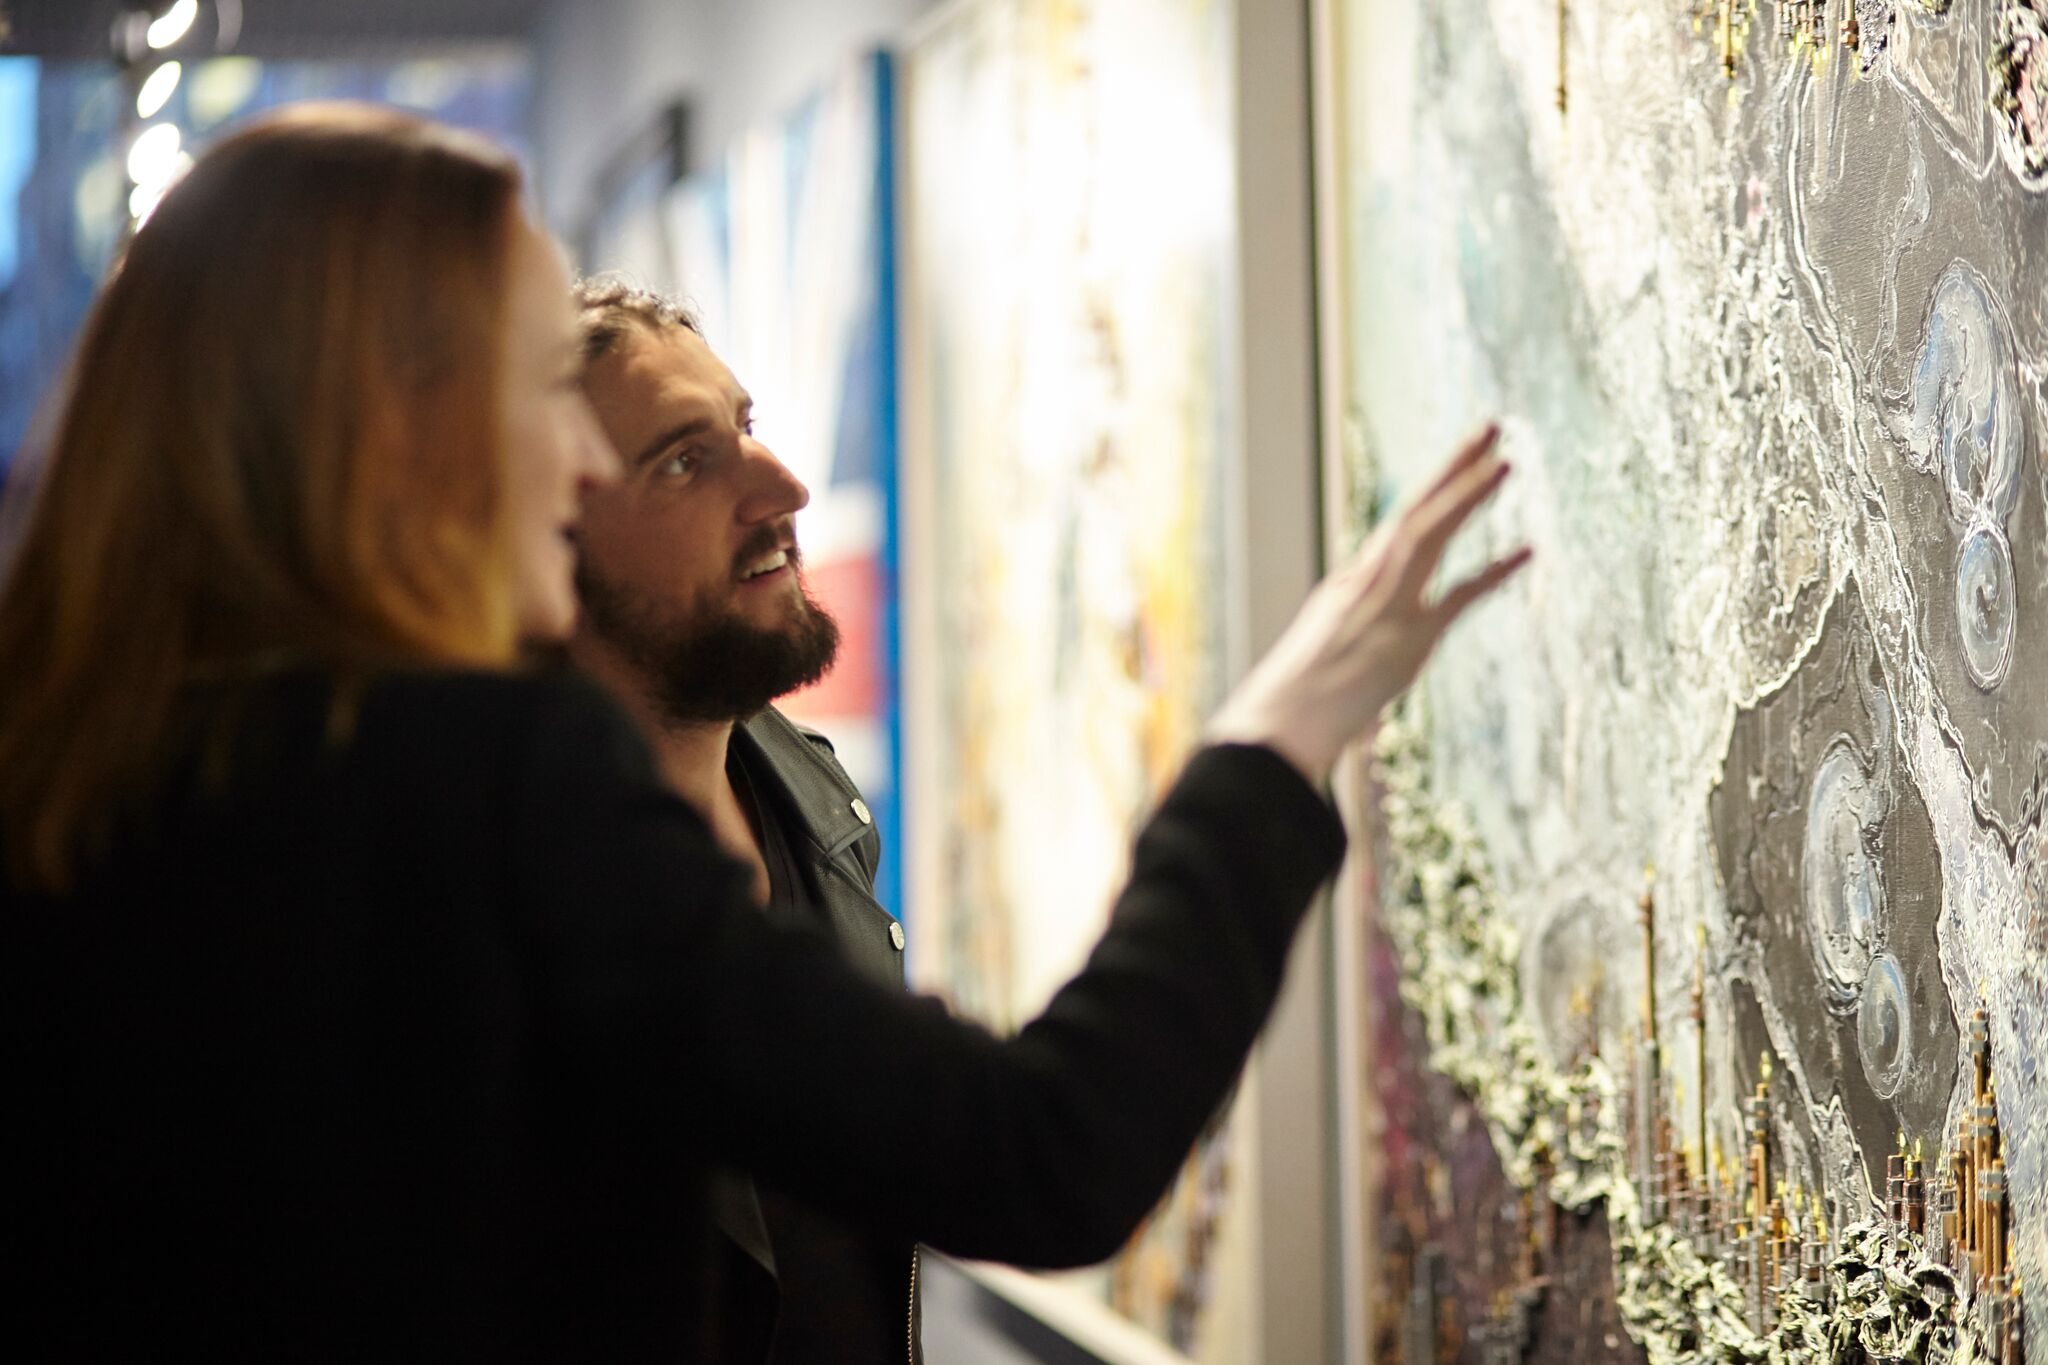 CAMA Gallery: From Tehran to London – Jdeed